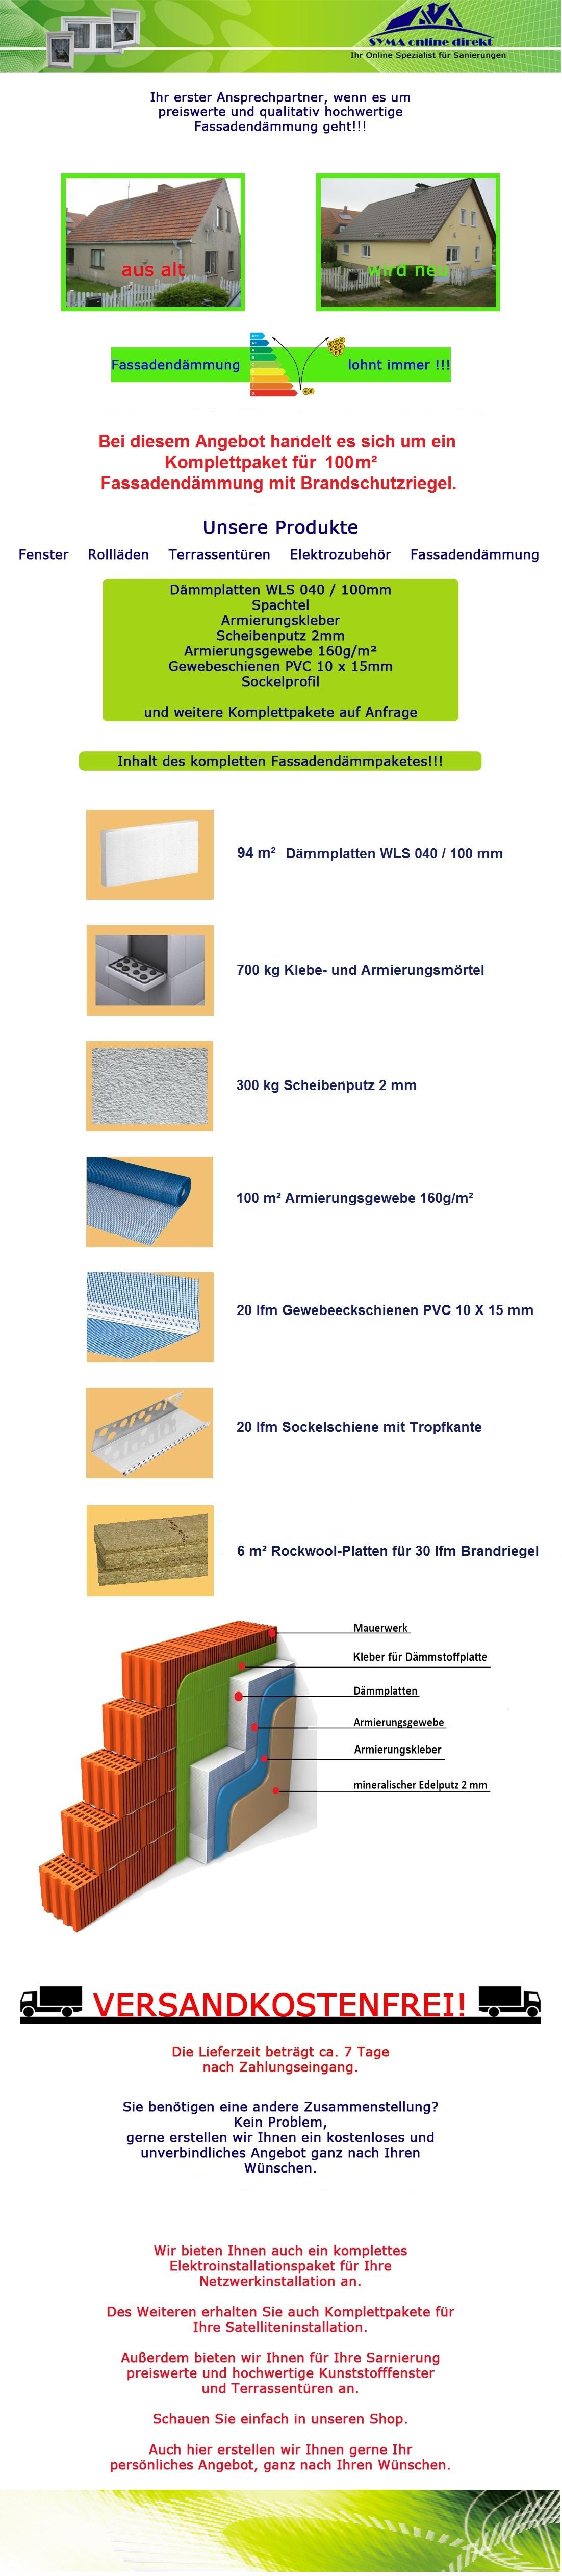 Wdvs Fassaden Brandriegel Paket 100 M² 100mm 040 146341 Ebay